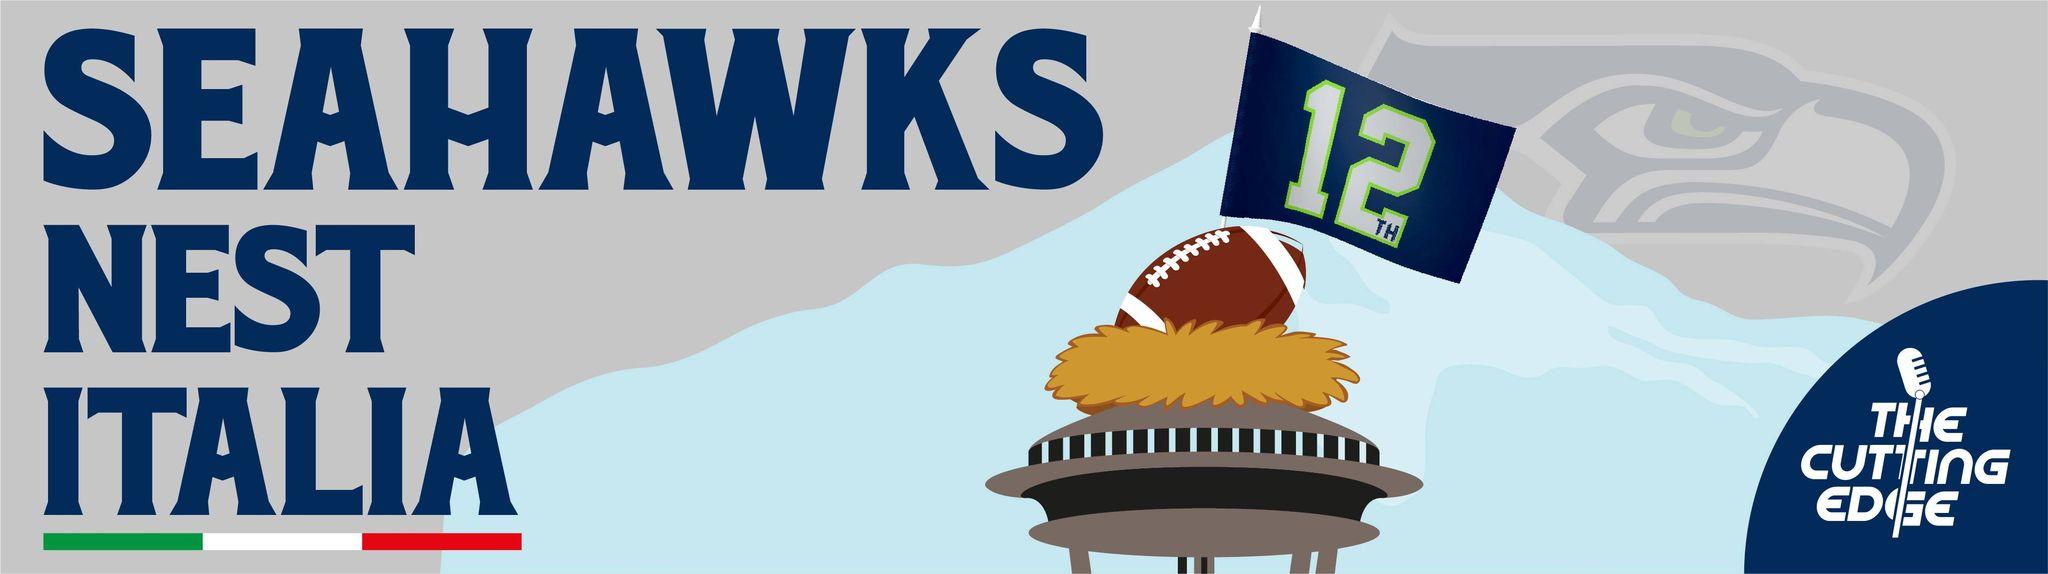 Seahawks Nest